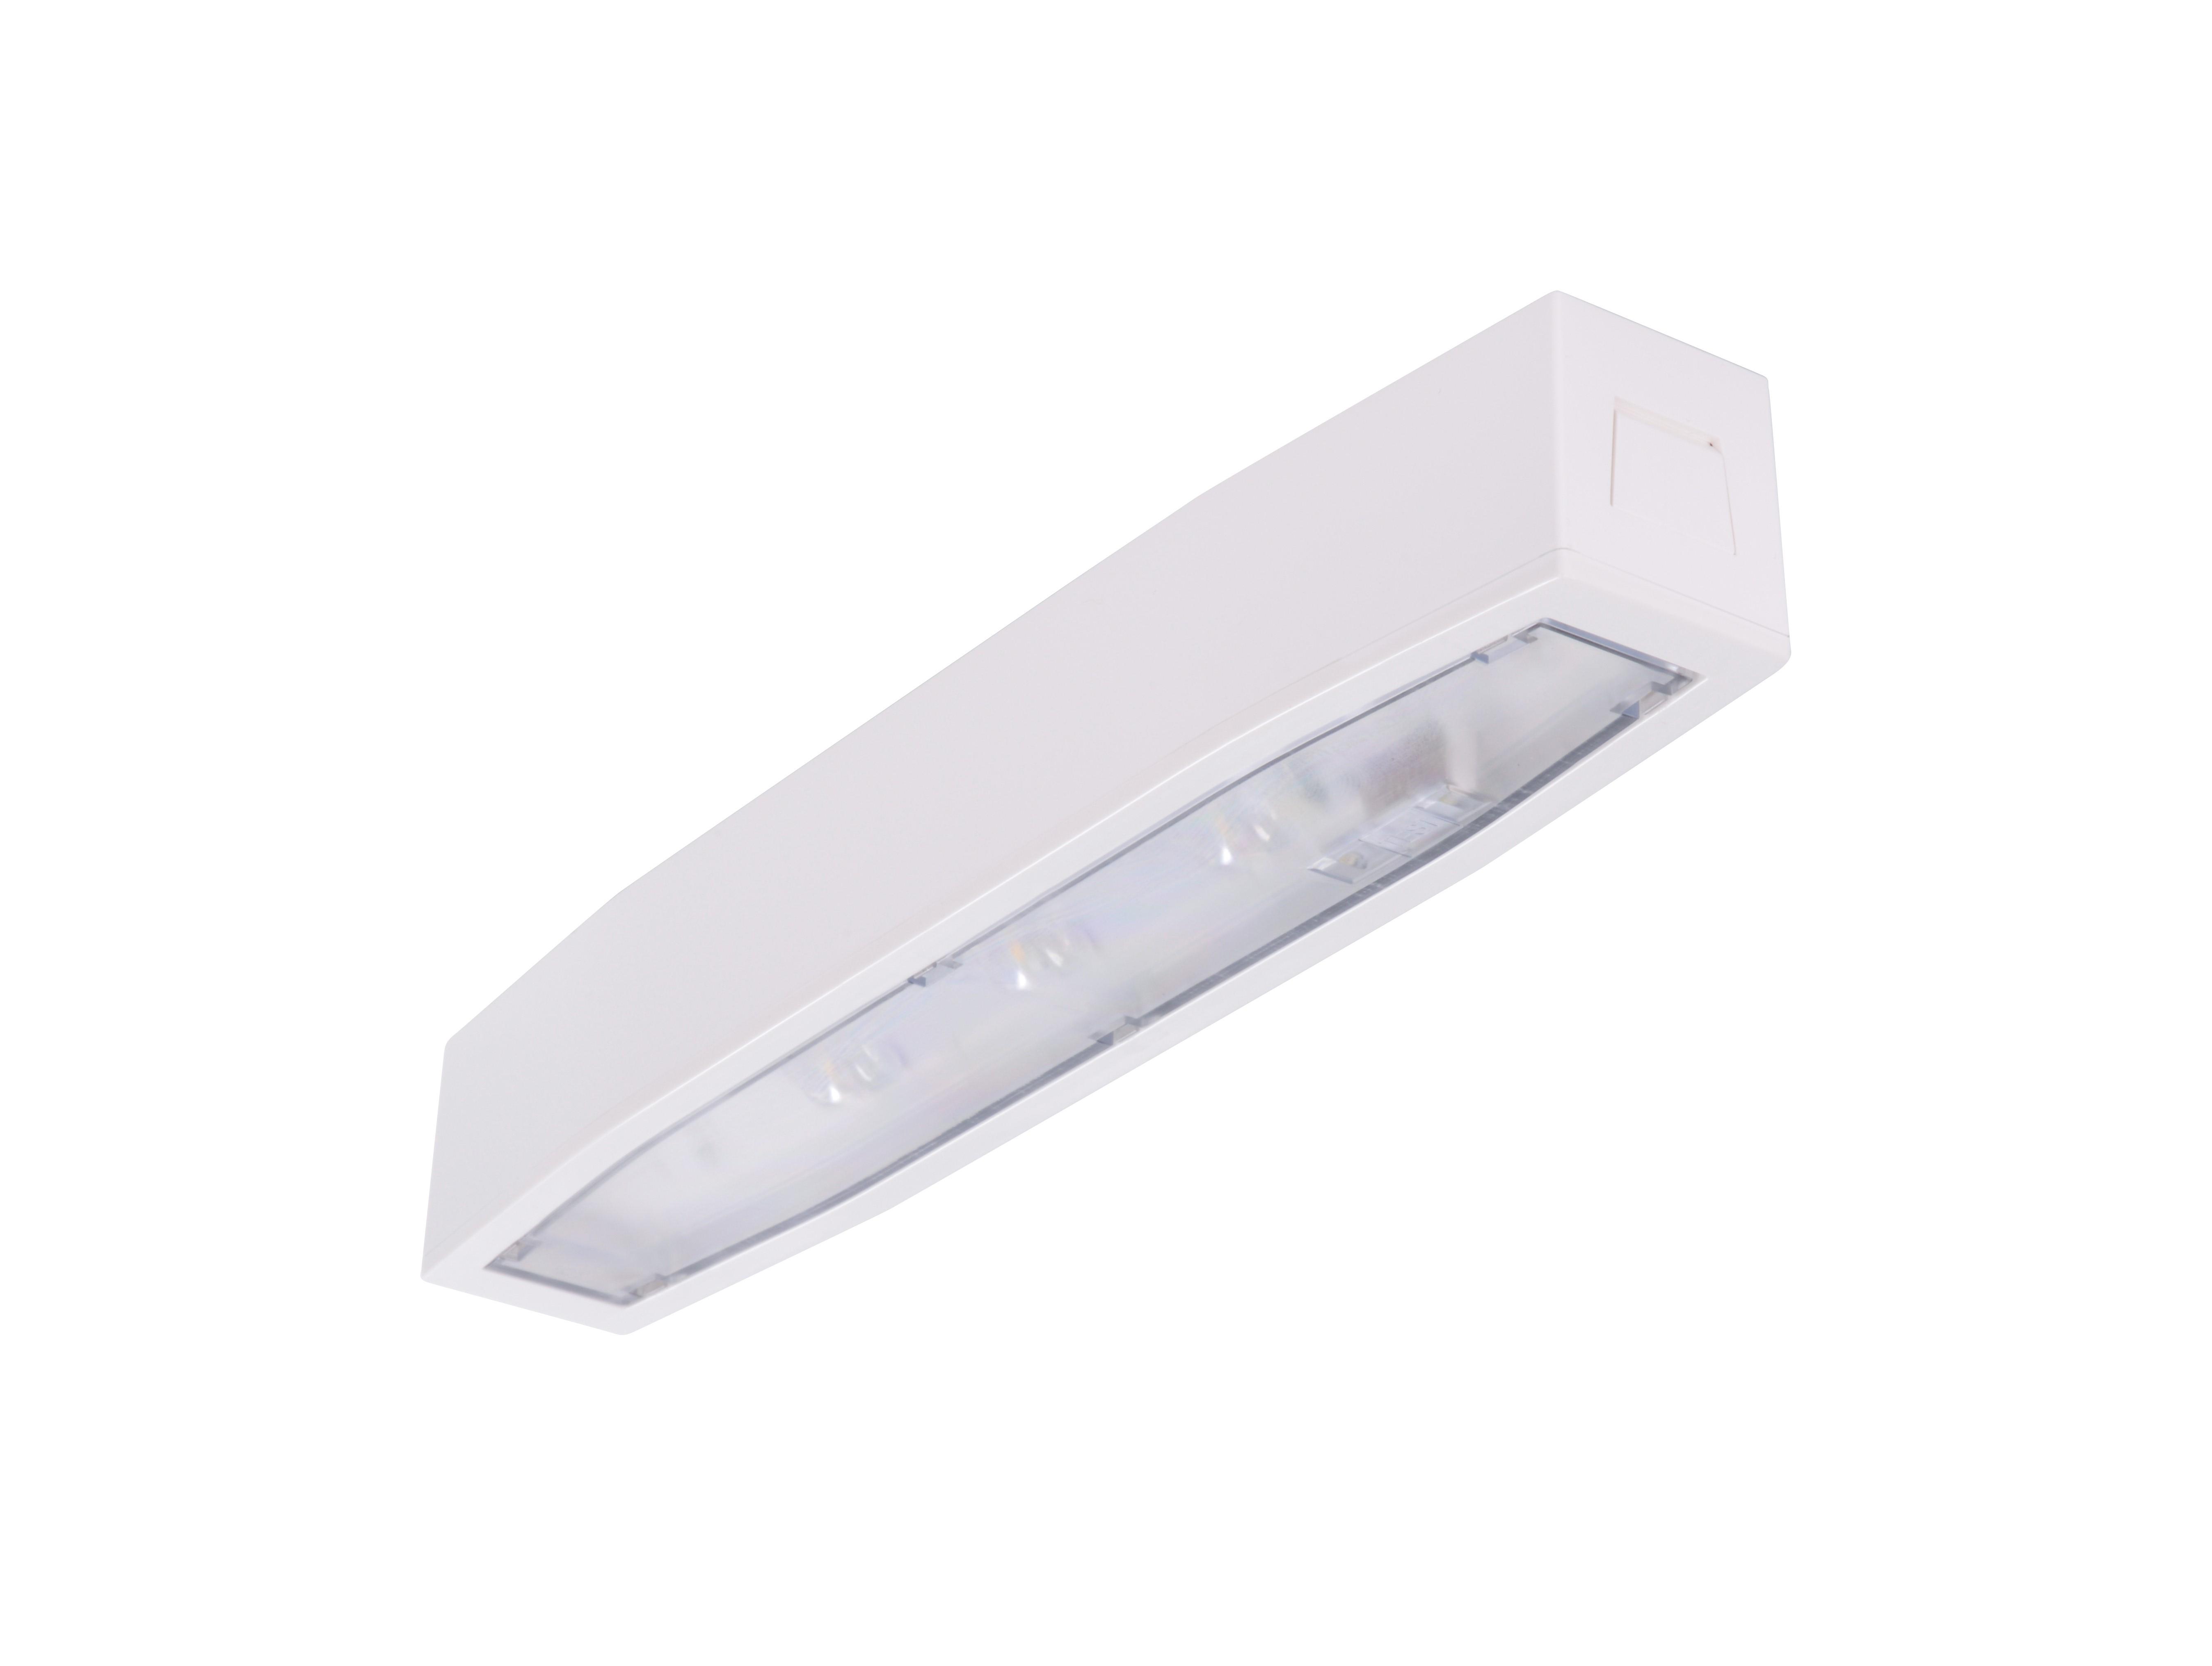 Lampa emergenta led Intelight 94562   3h mentinut test automat 0